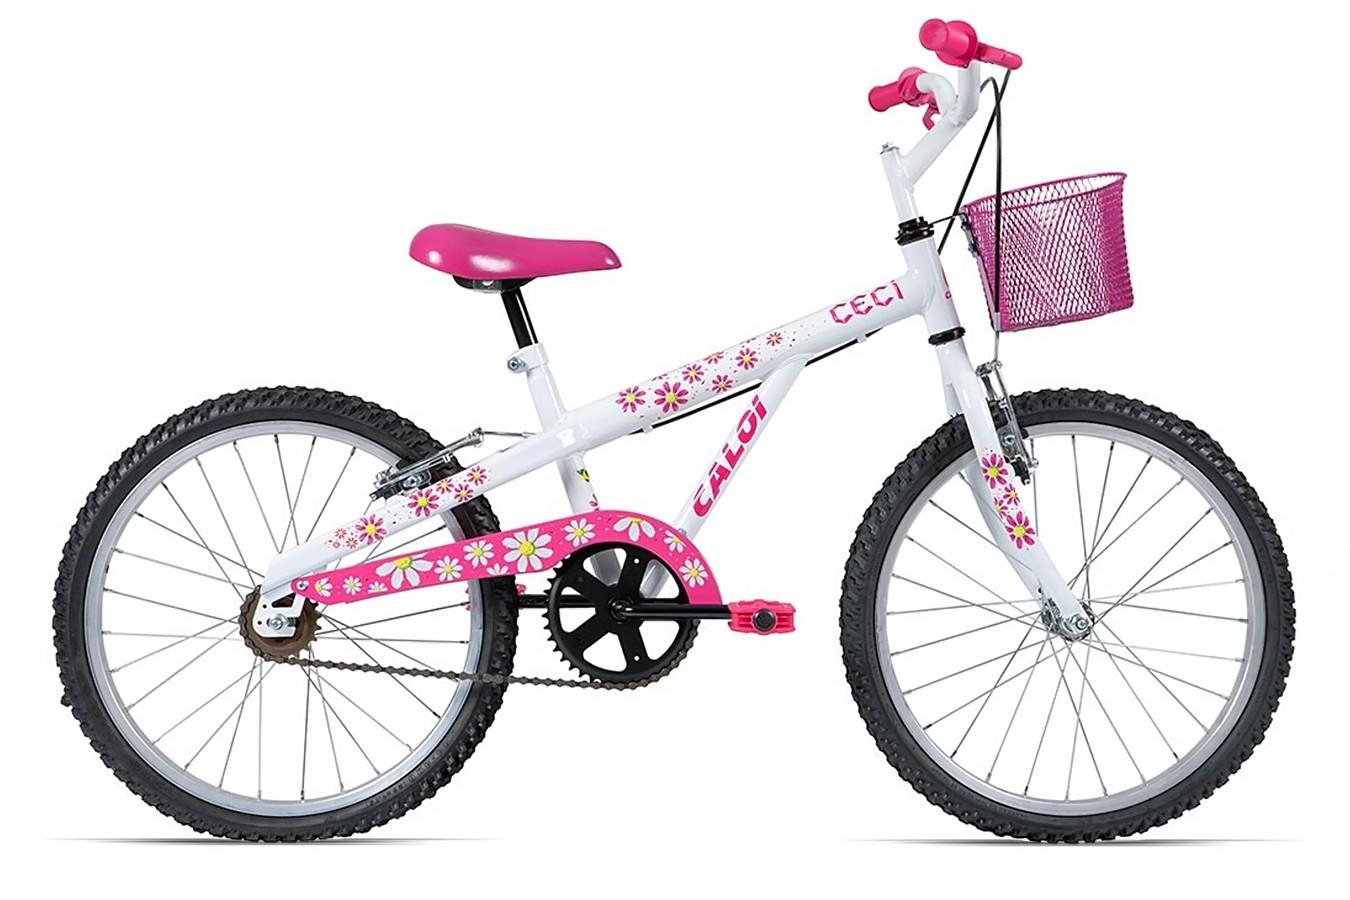 Bicicleta 20 Feminina Ceci - Caloi